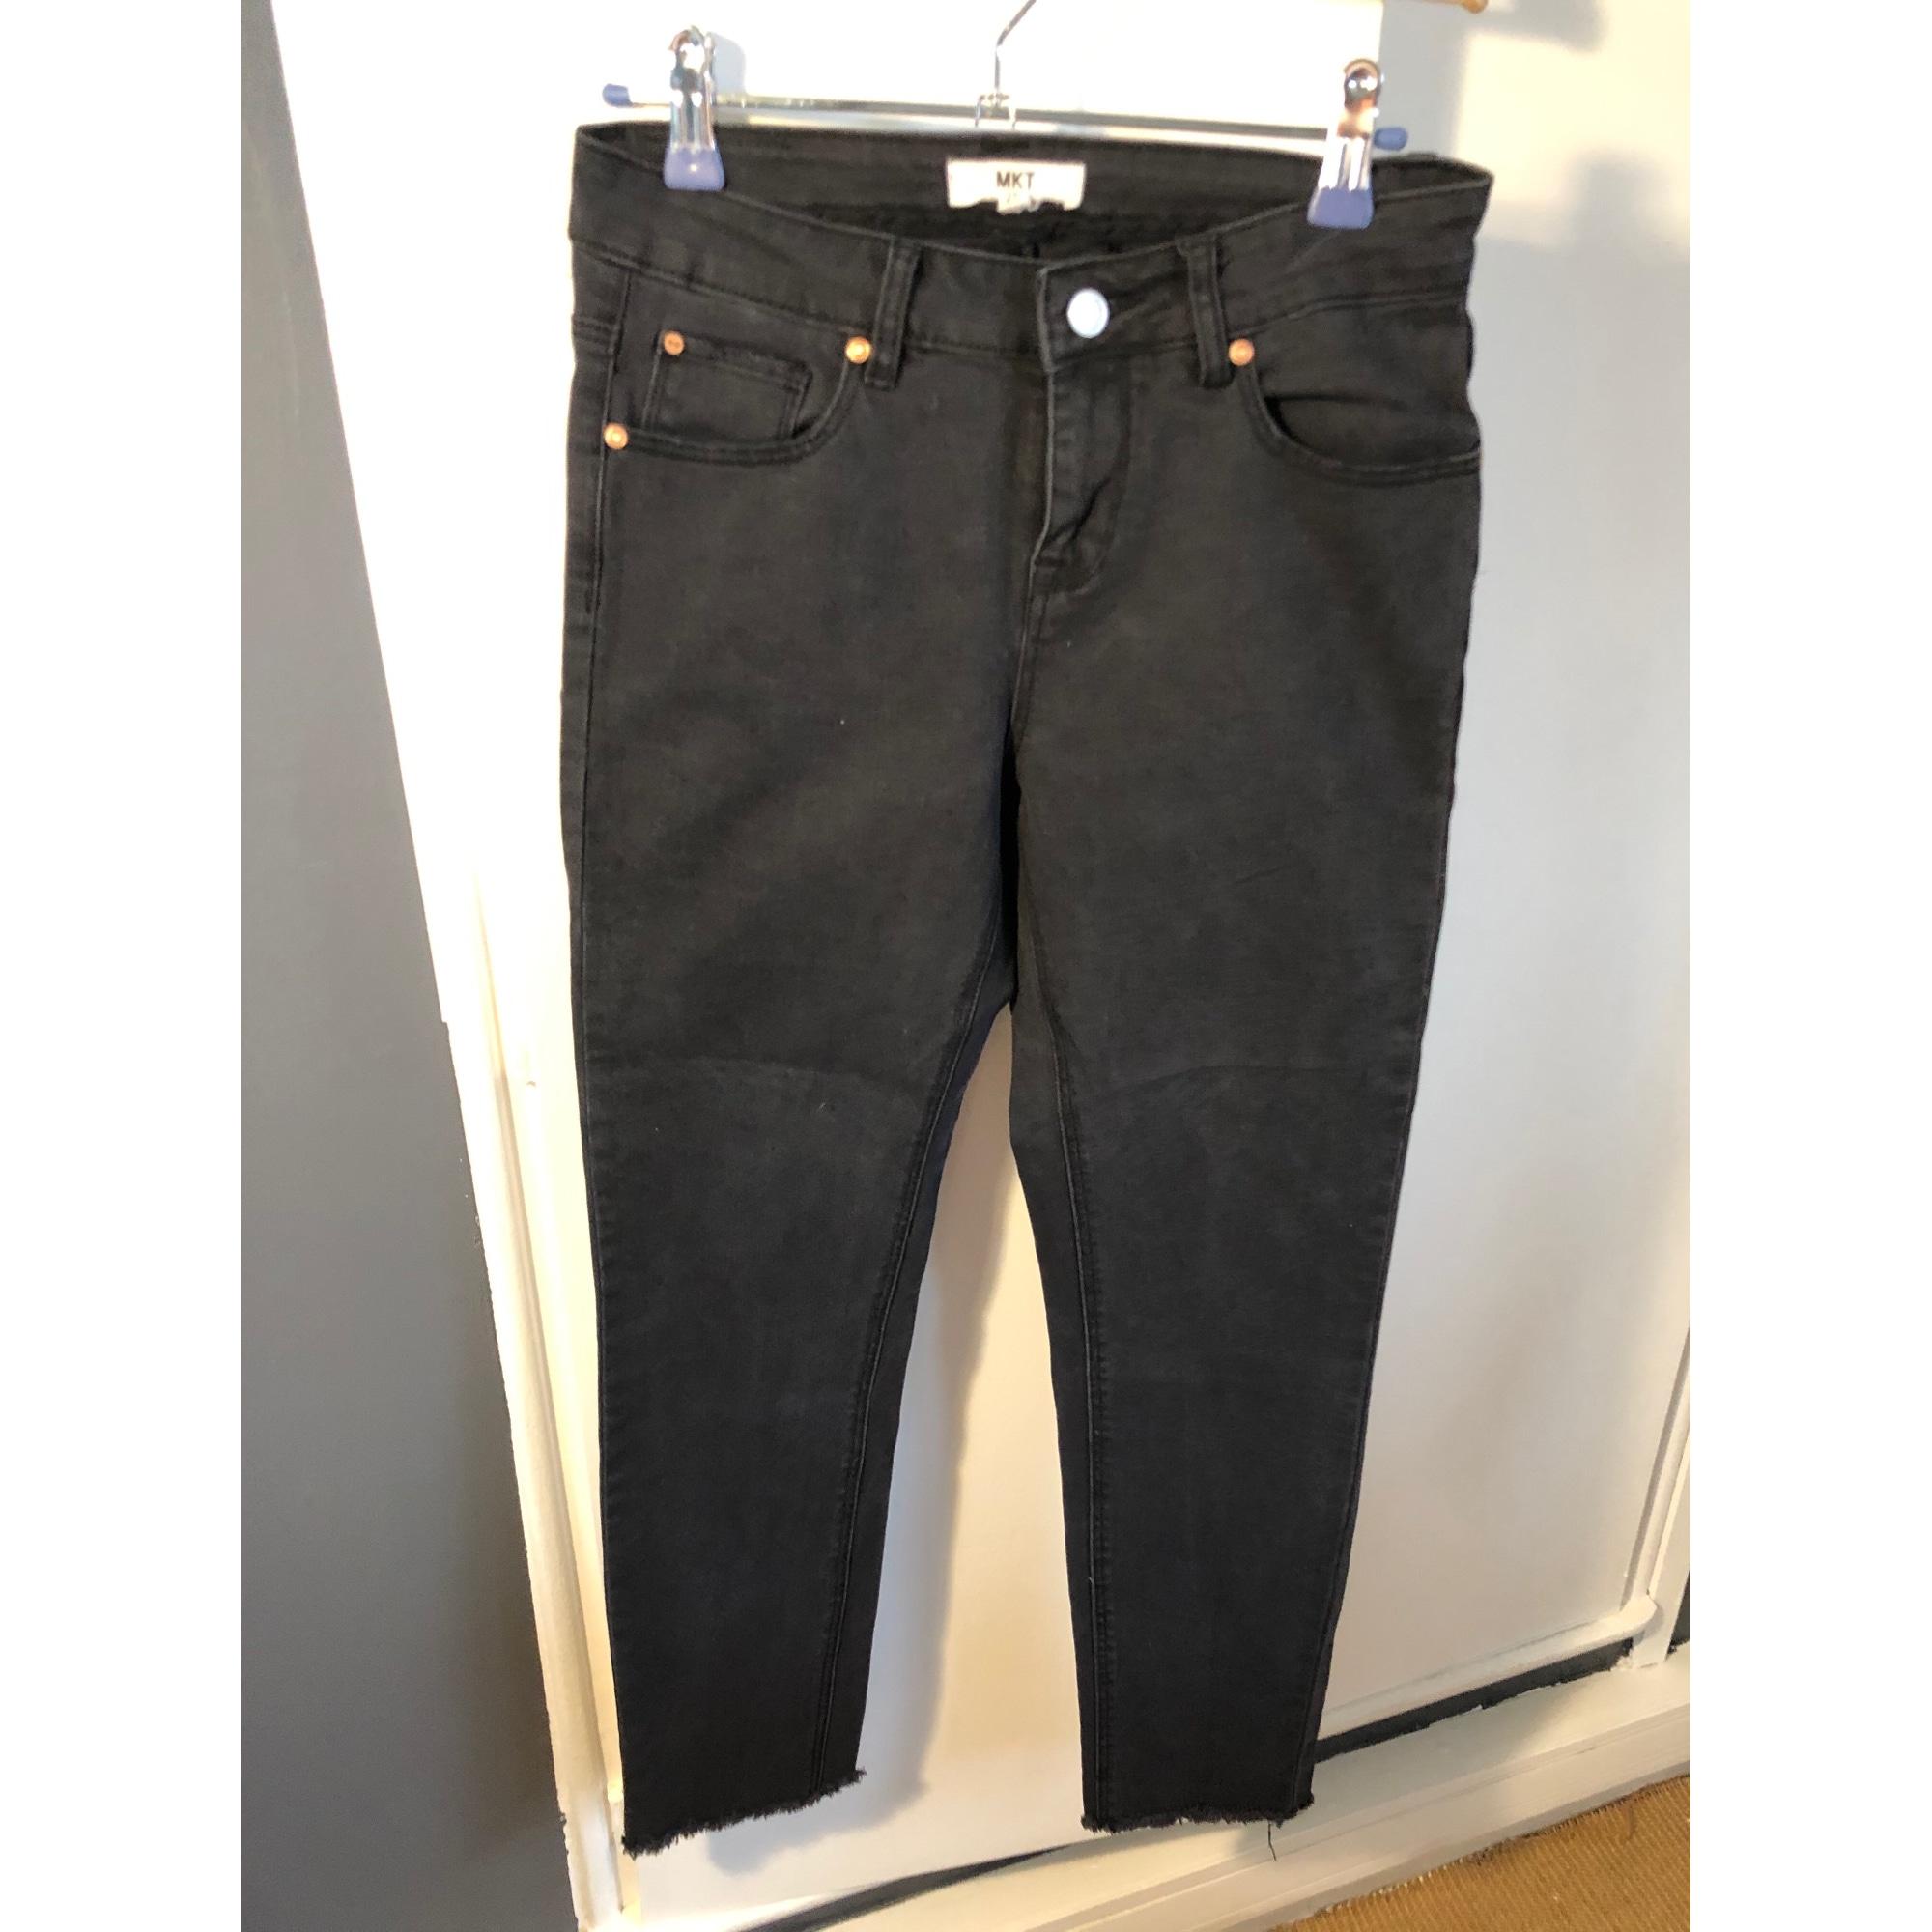 Jeans slim MKT Noir